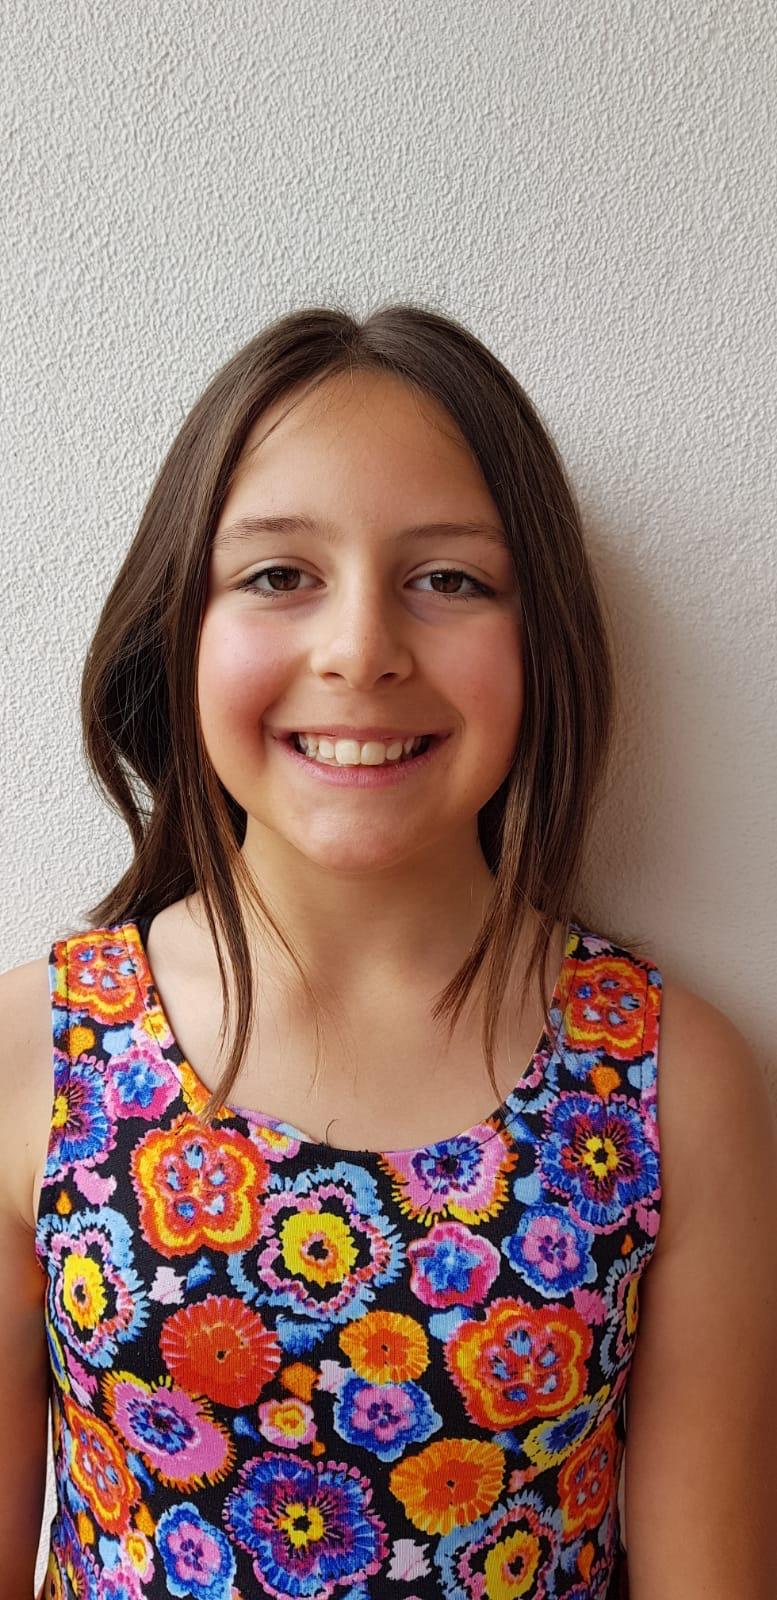 Shaylee Goodman - Grade 6